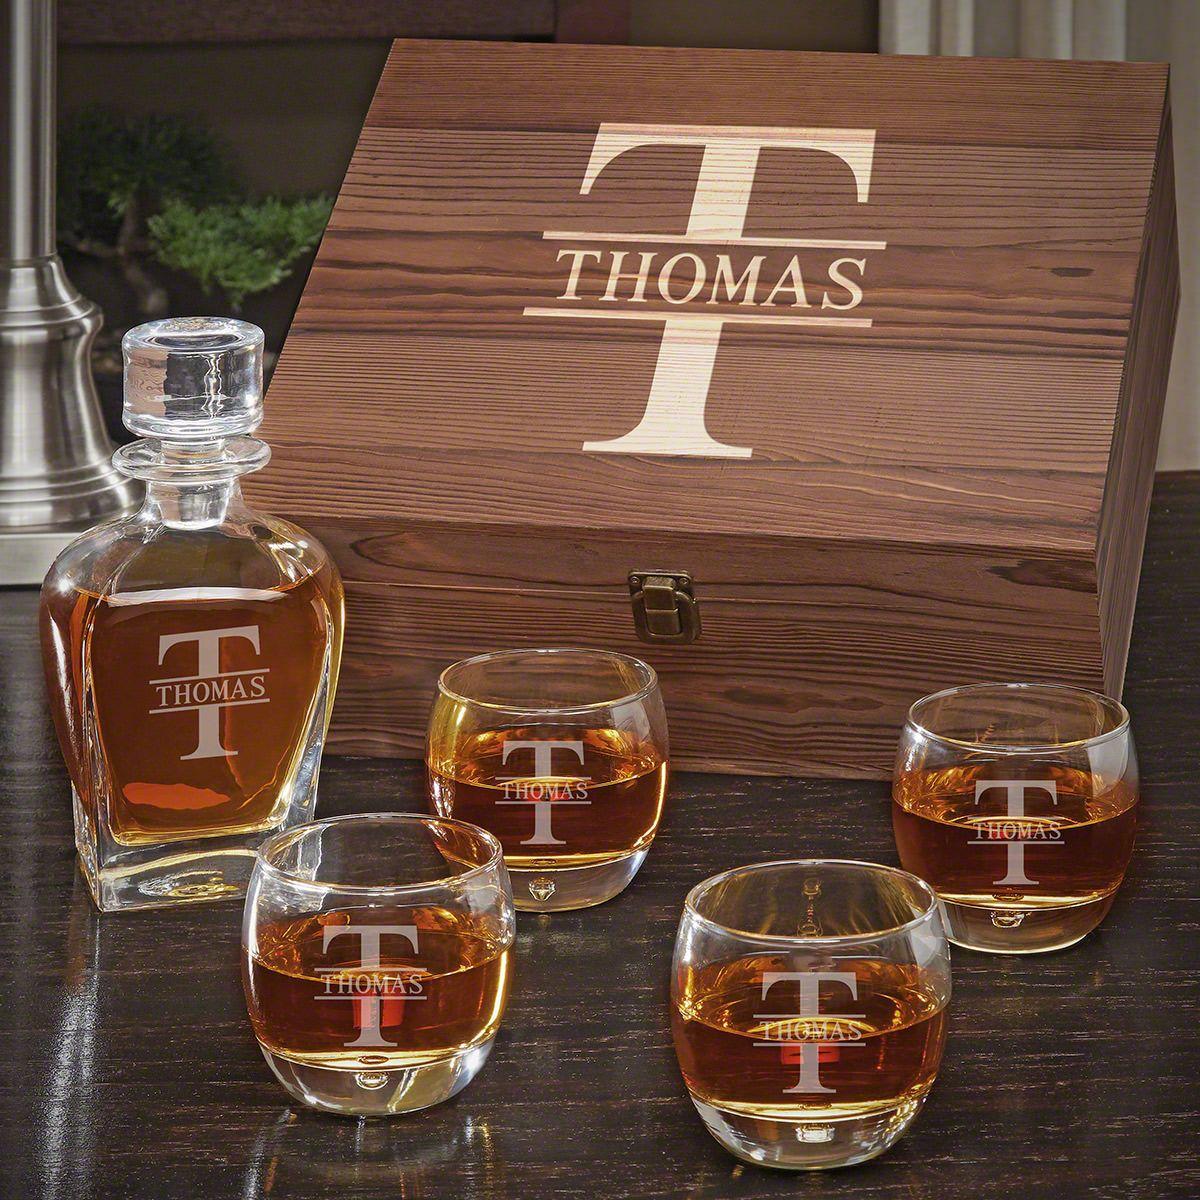 Oakmont Engraved Whiskey Draper Decanter Set with Uptown Glasses